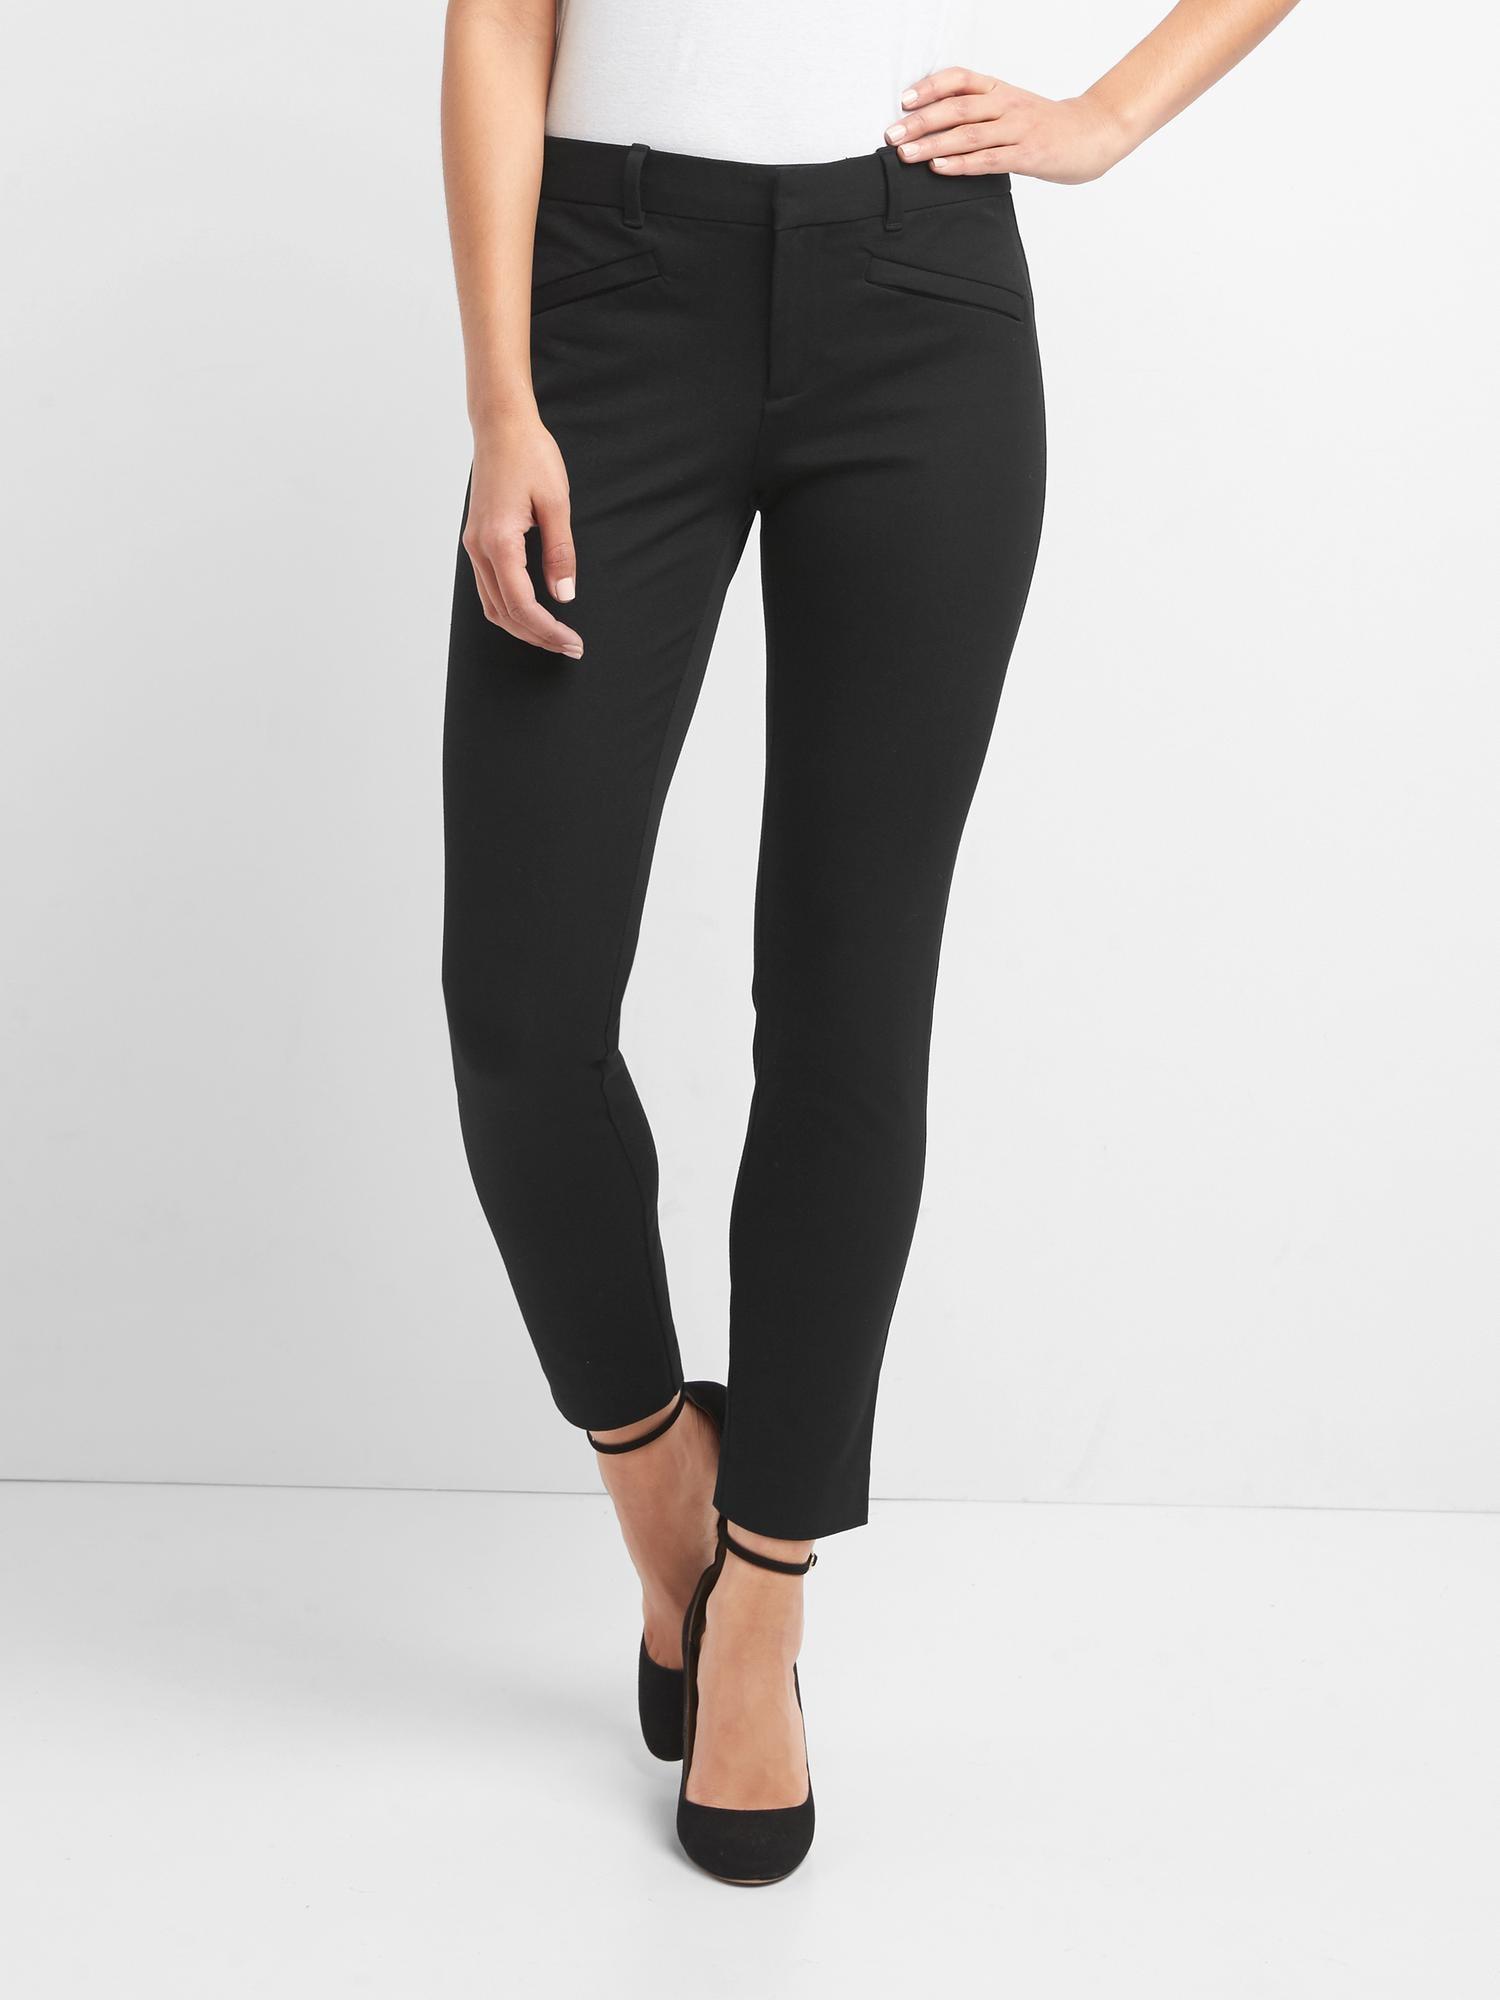 Gap Black Signature Skinny Ankle Pants with Secret Smoothing Pockets 4 Petite